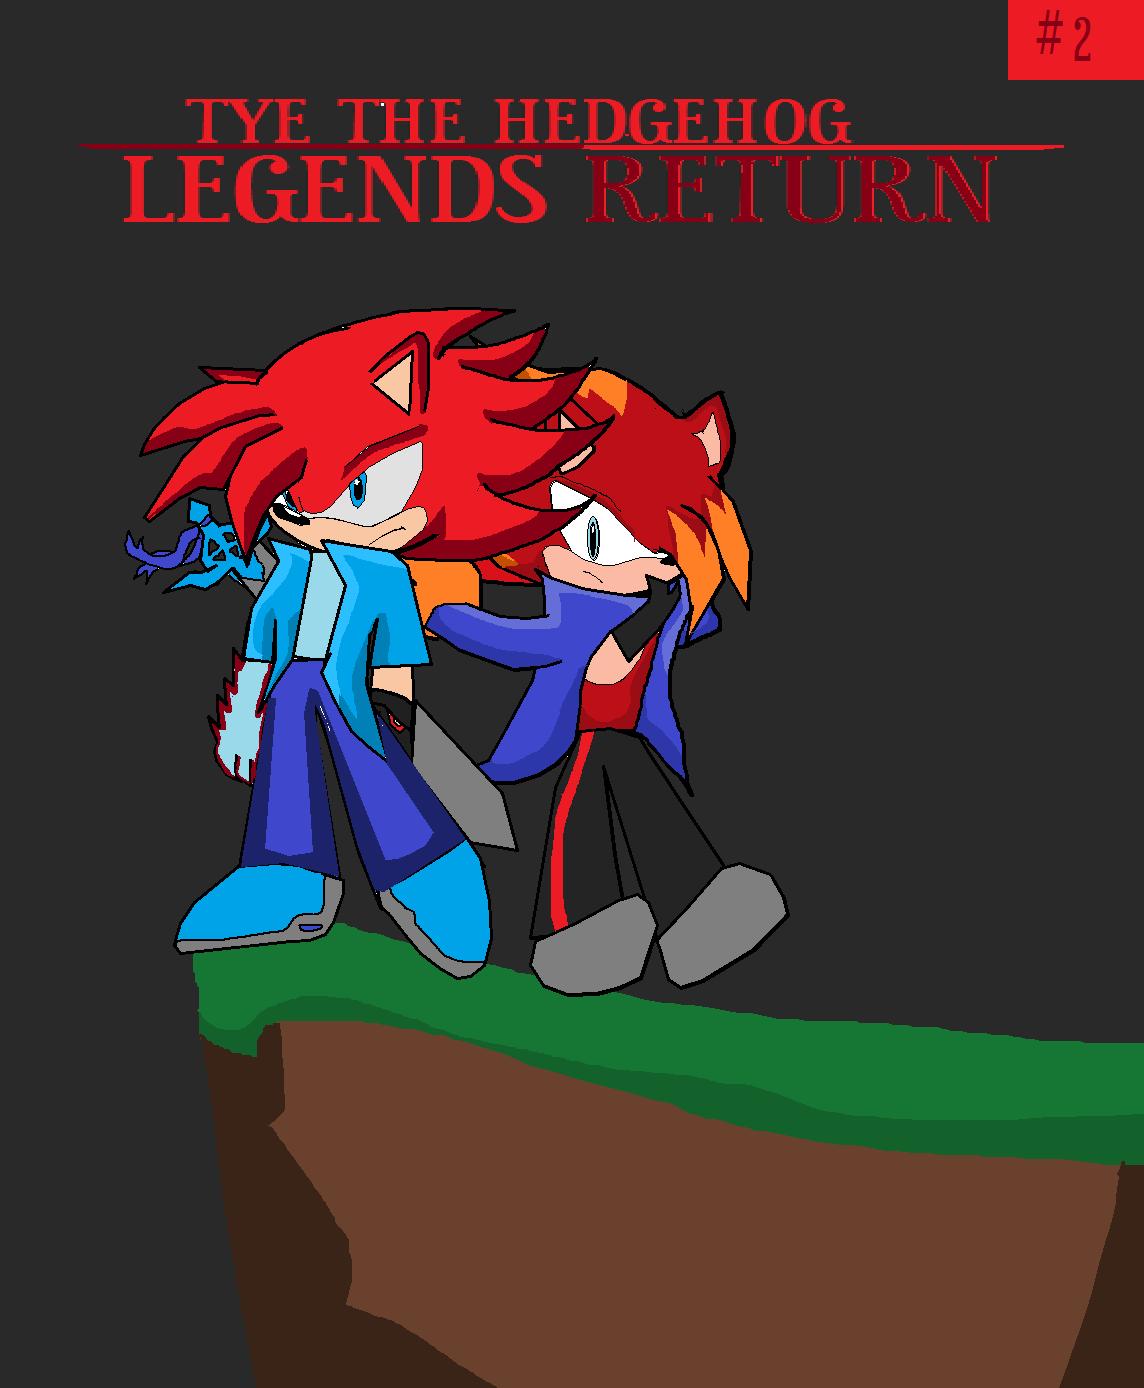 Tye: Legends Return